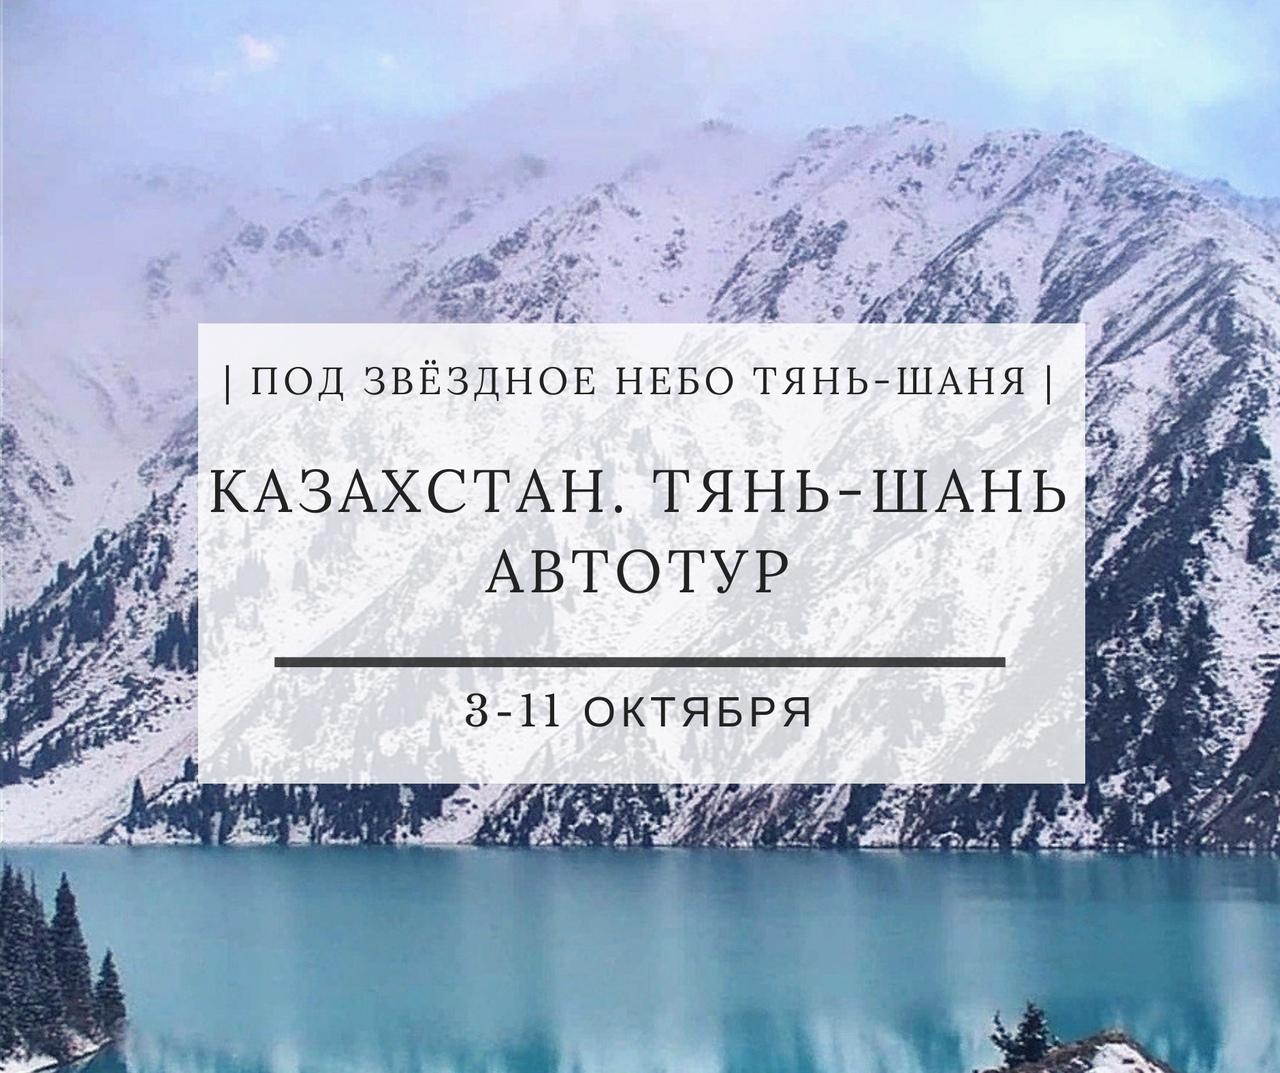 Афиша Тюмень КАЗАХСТАН / ТЯНЬ-ШАНЬ / АВТОТУР / 3-11 ОКТЯБРЯ